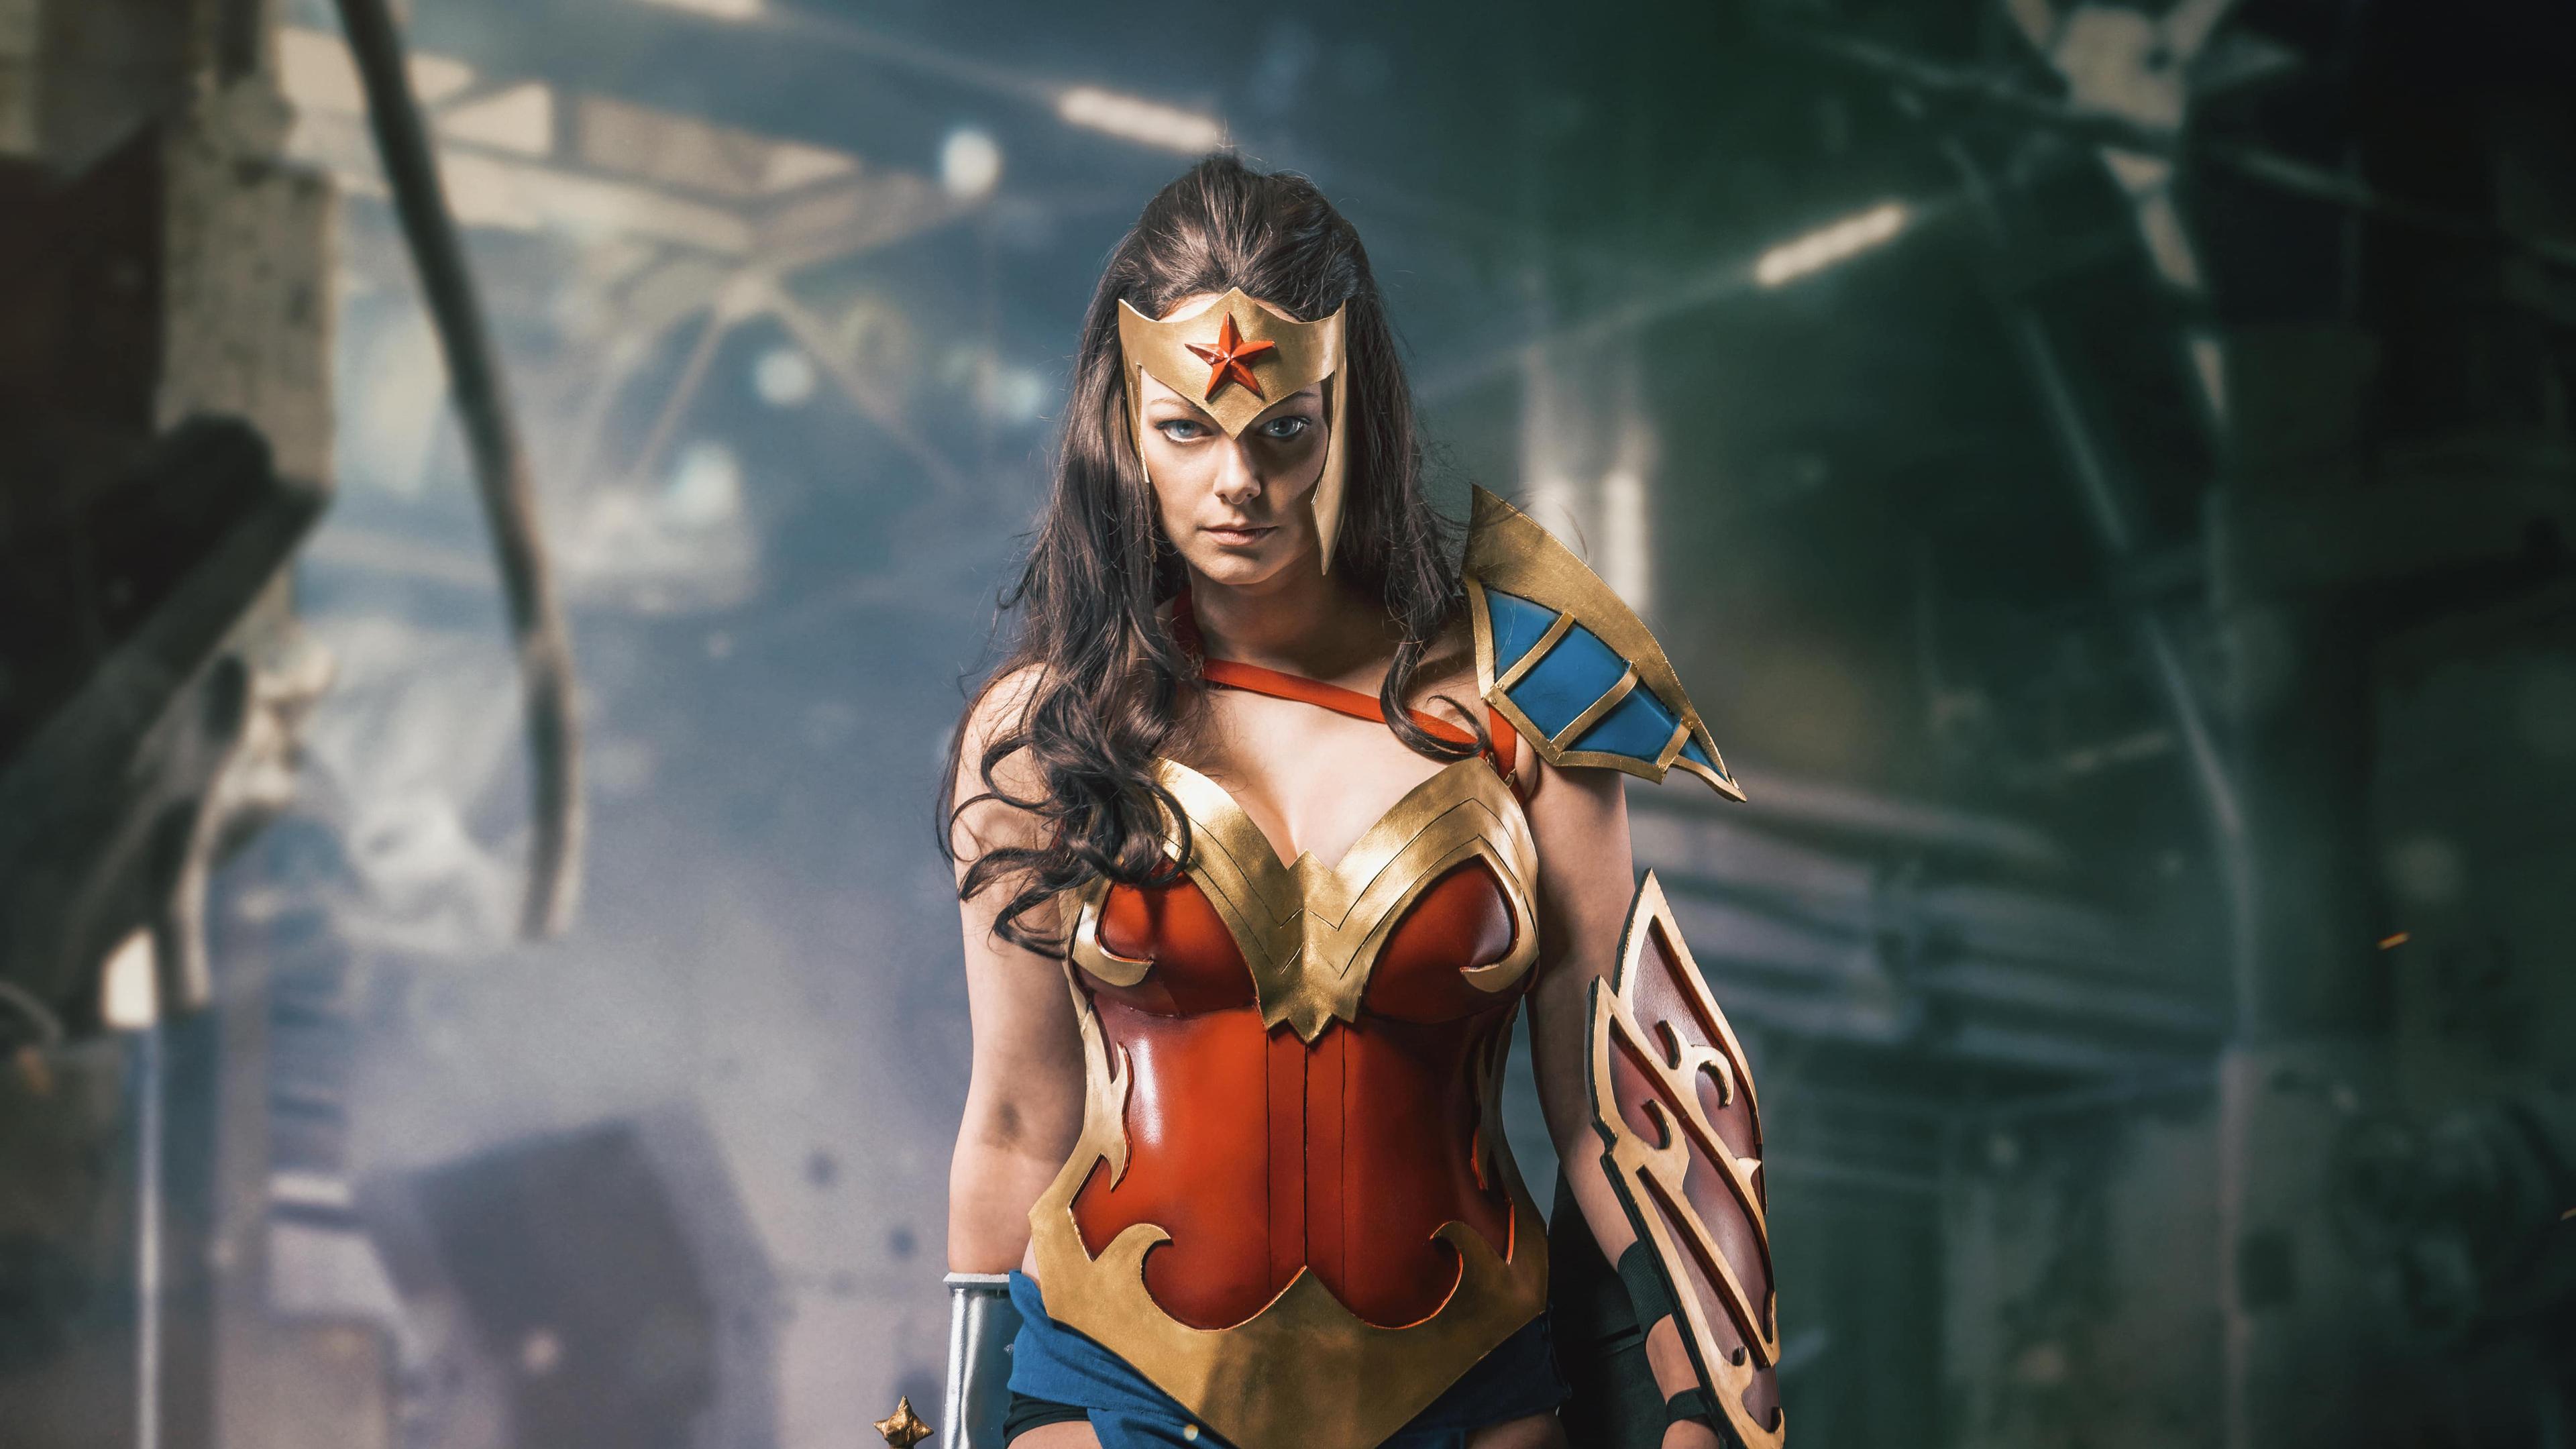 wonder woman cosplay 4k 1554245039 - Wonder Woman Cosplay 4k - wonder woman wallpapers, superheroes wallpapers, hd-wallpapers, cosplay wallpapers, 5k wallpapers, 4k-wallpapers